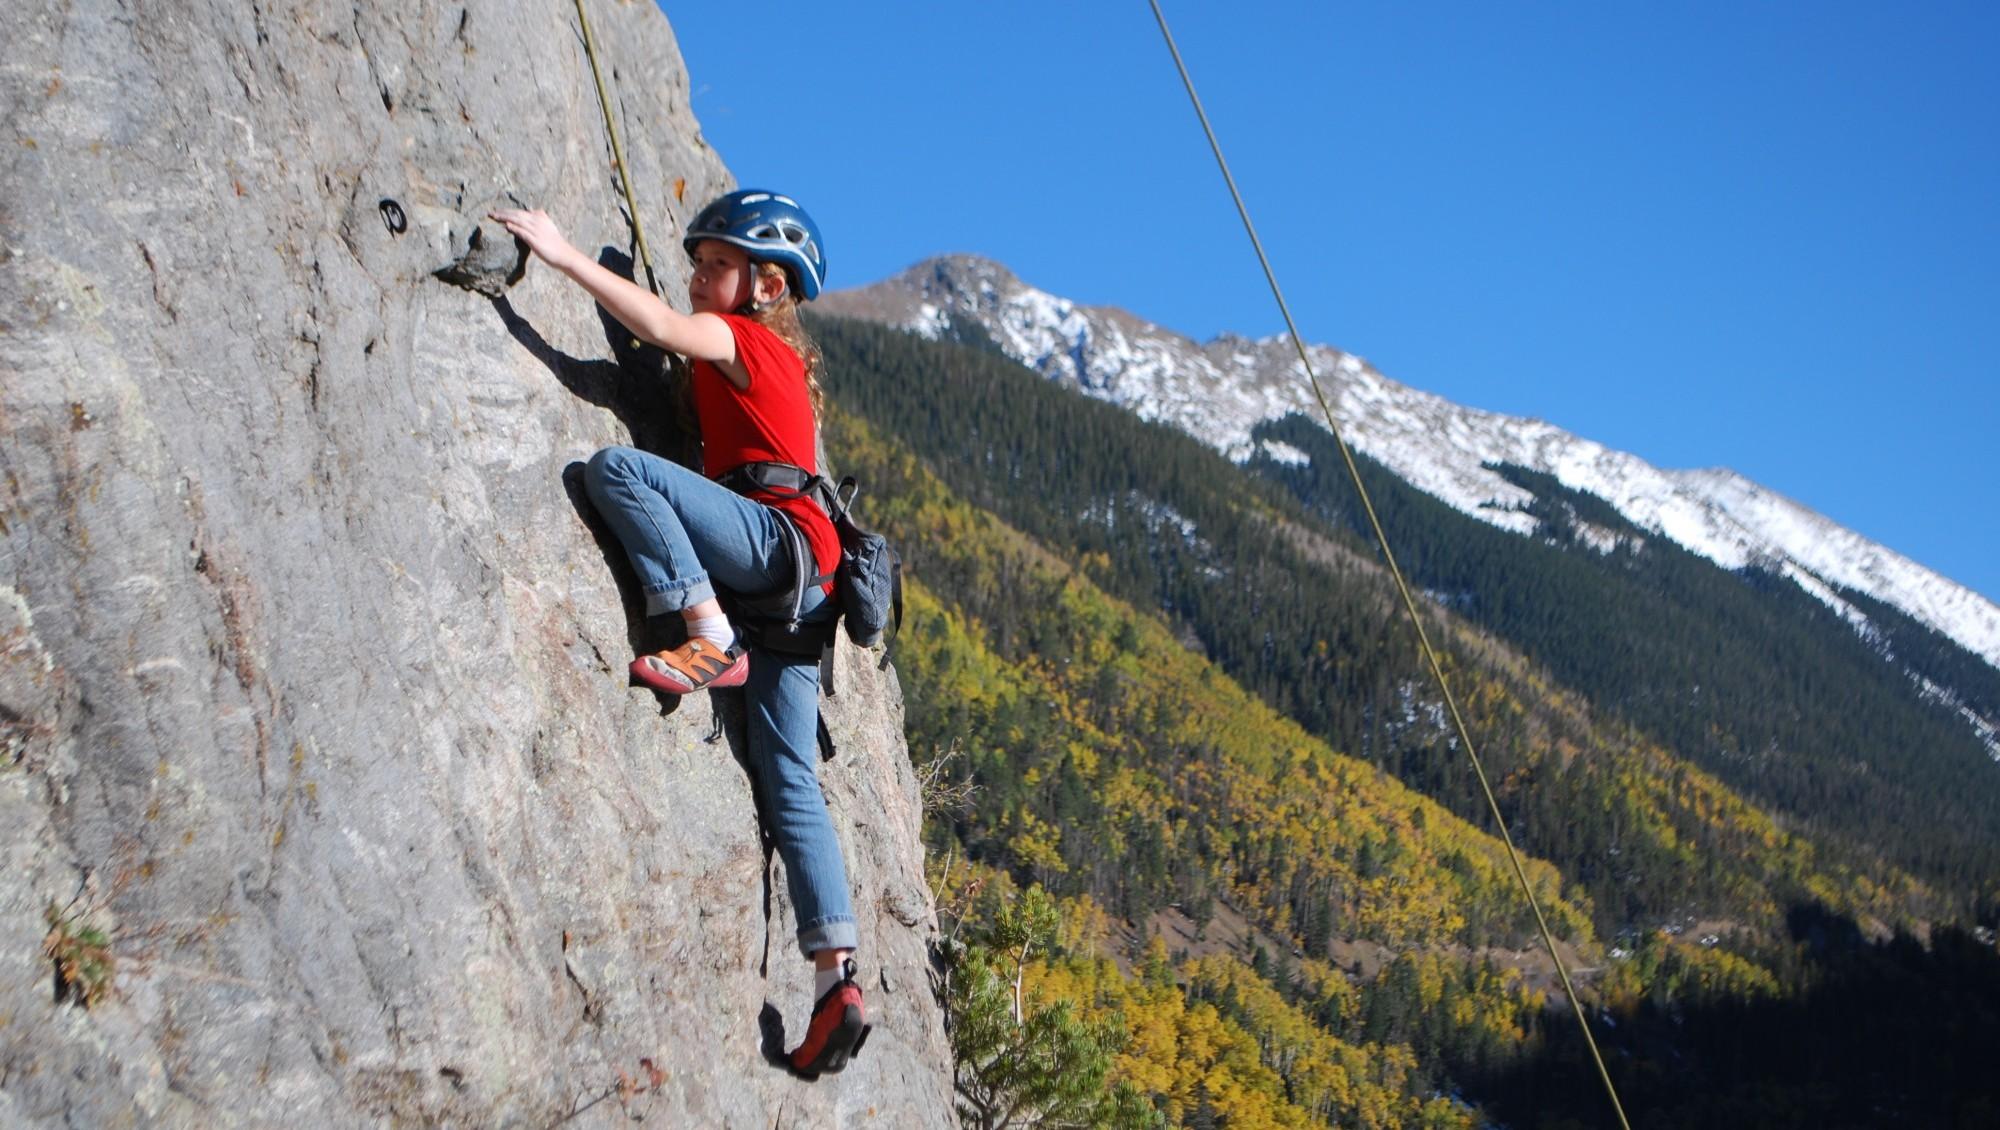 Learn Rock Climbing in North Carolina | Travel with REI